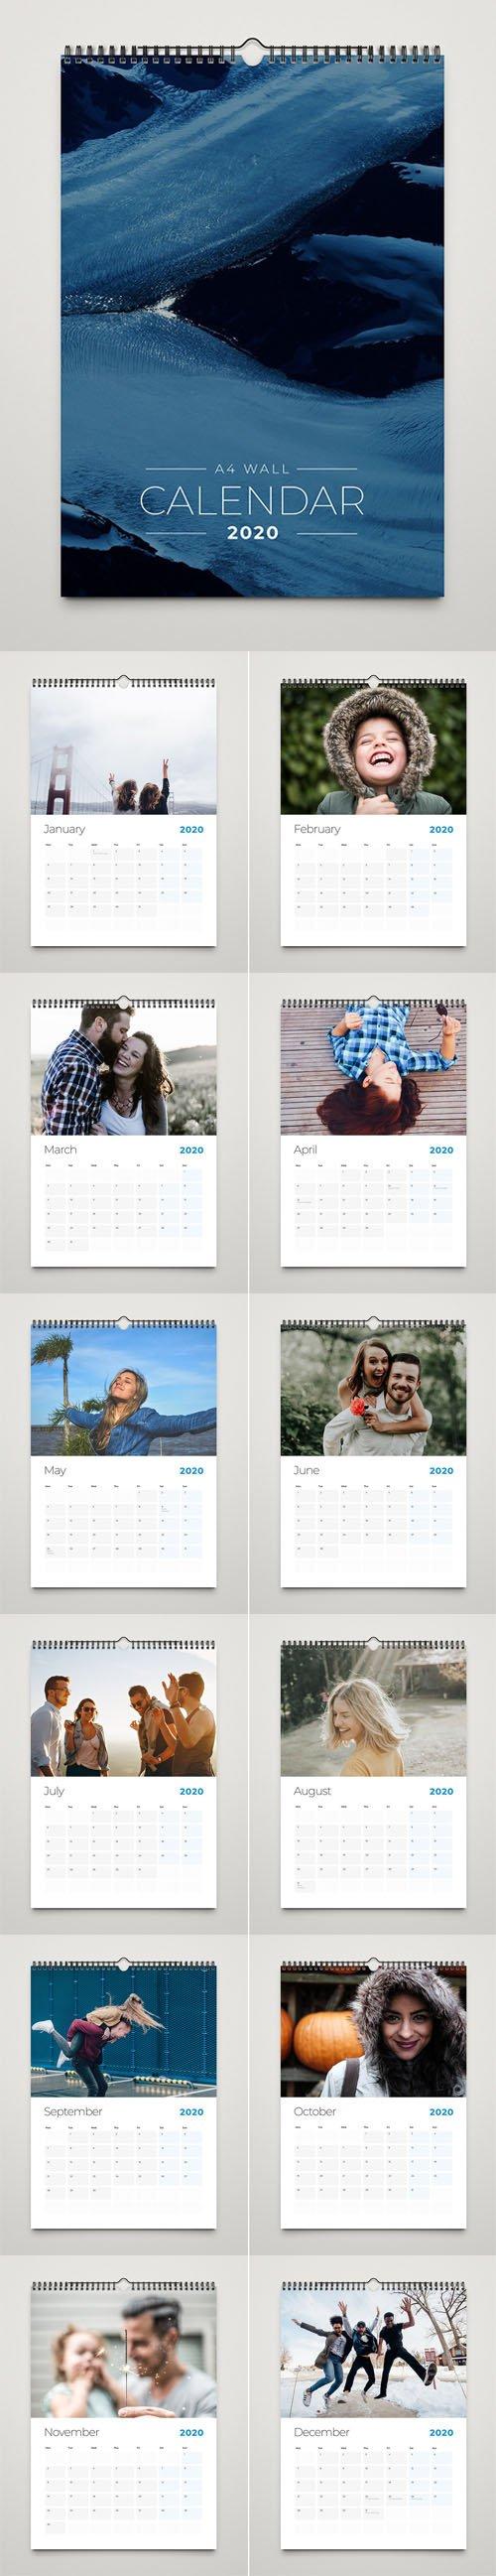 A4 Wall Calendar 2020 InDesign Template